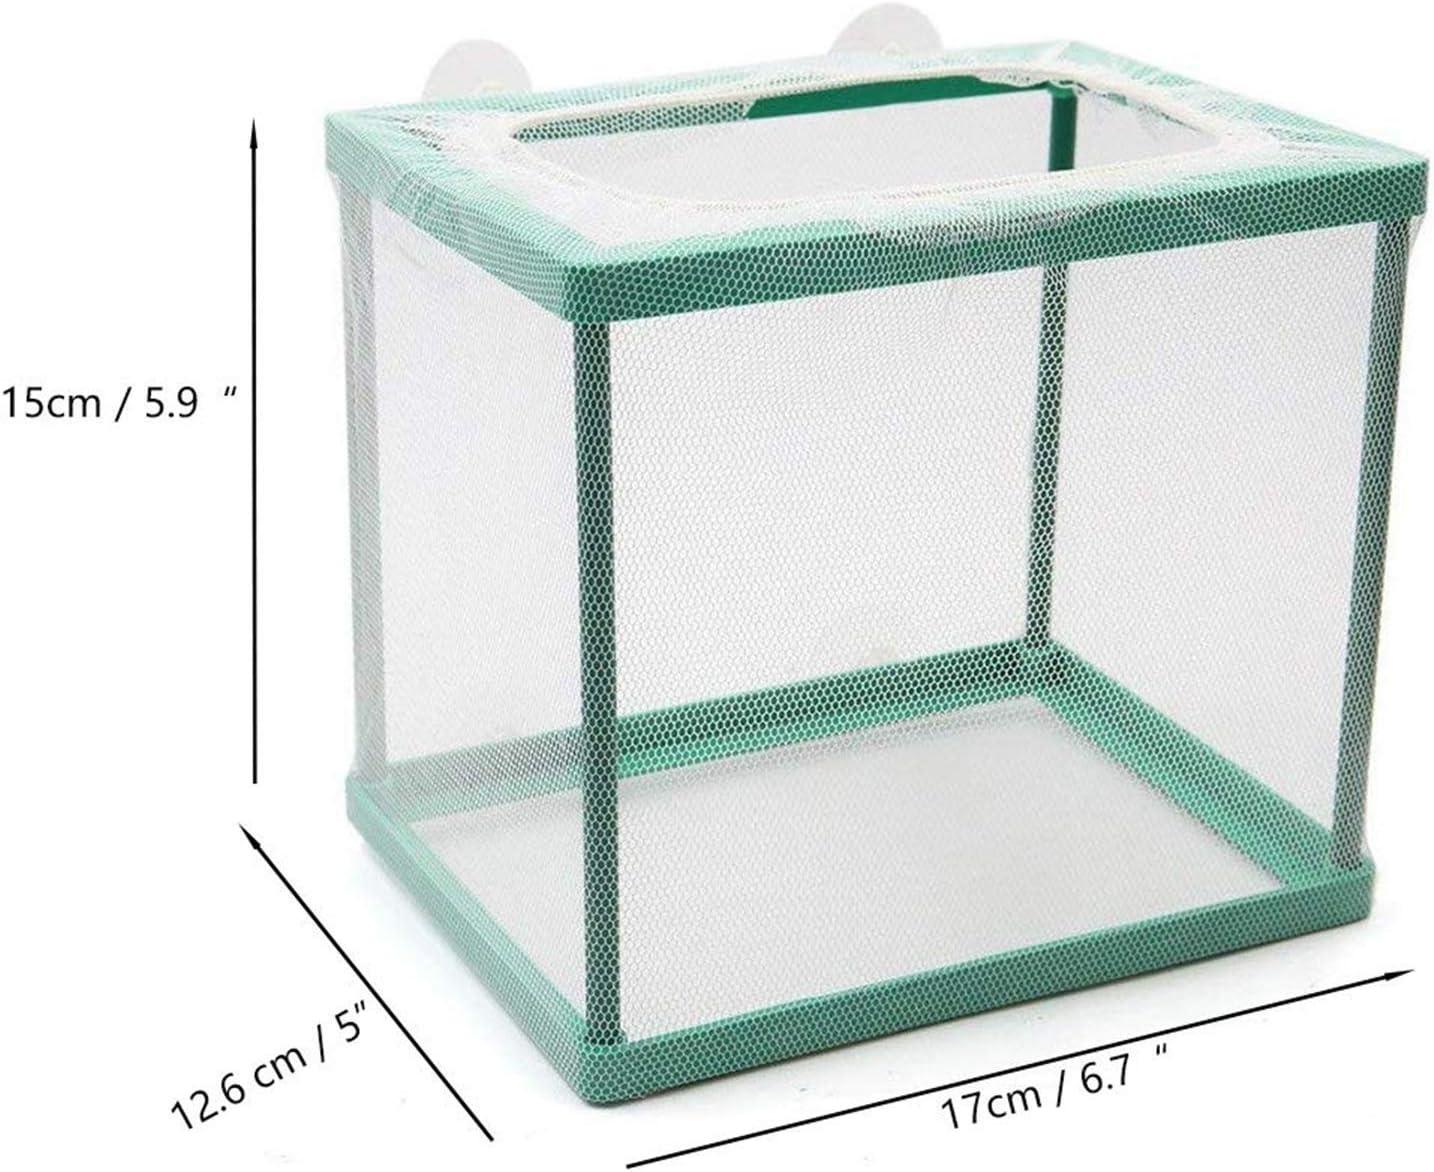 COMOK Fish Hatchery Breeder Box Aquarium Separation Net Nylon Incubator Mesh Fish Breeding Tanks Isolation Box Green Square